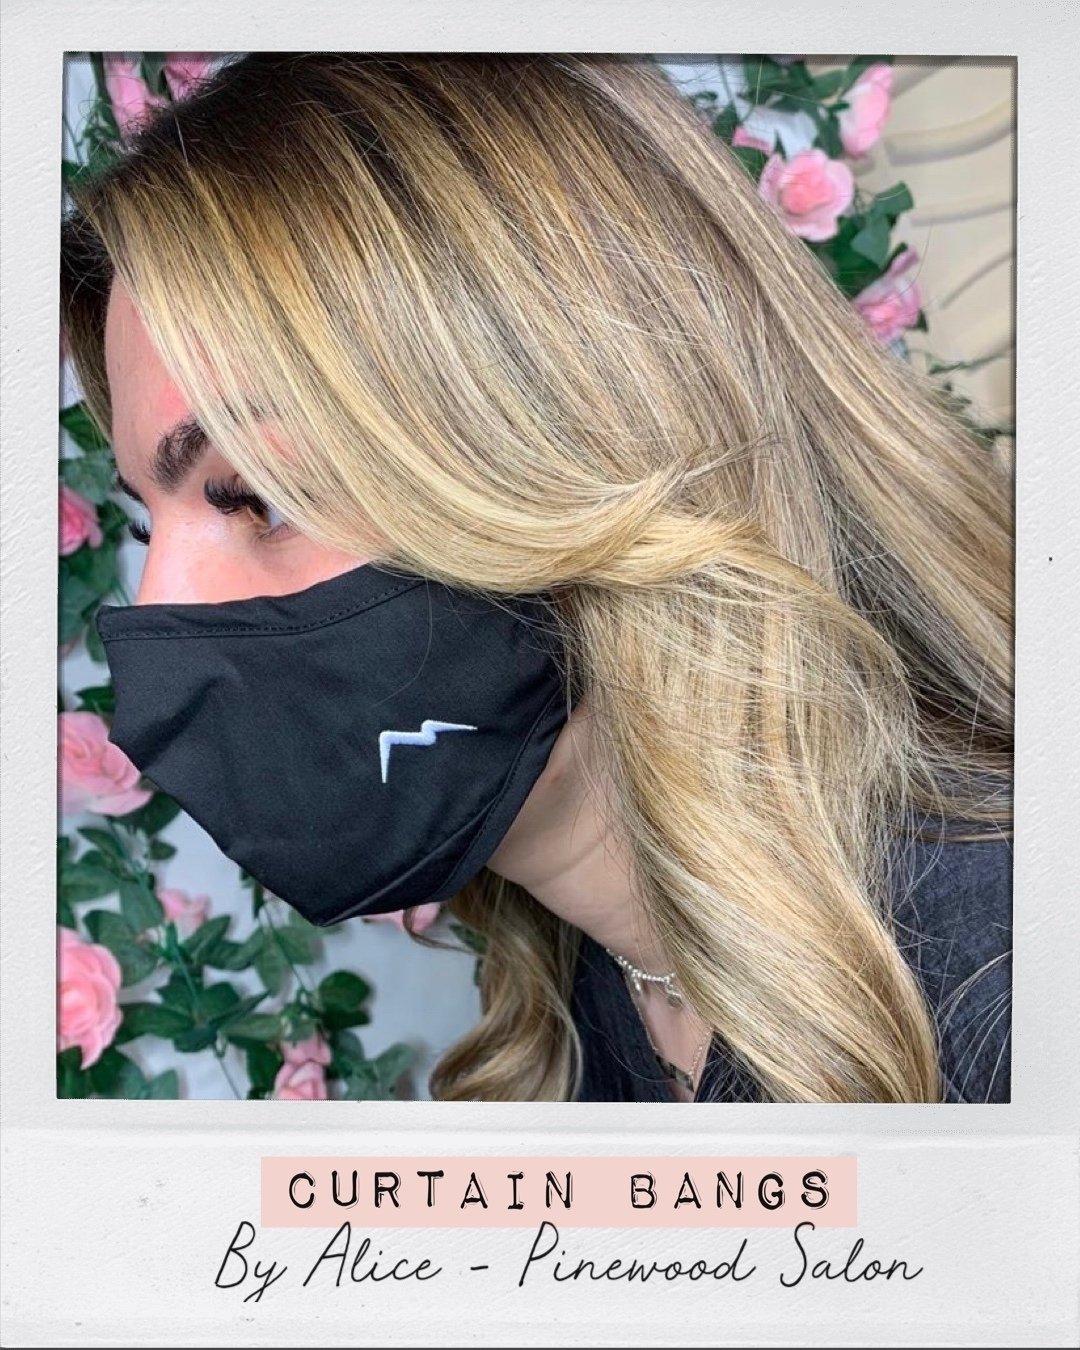 Curtain Bangs Hair Ministry Ipswich